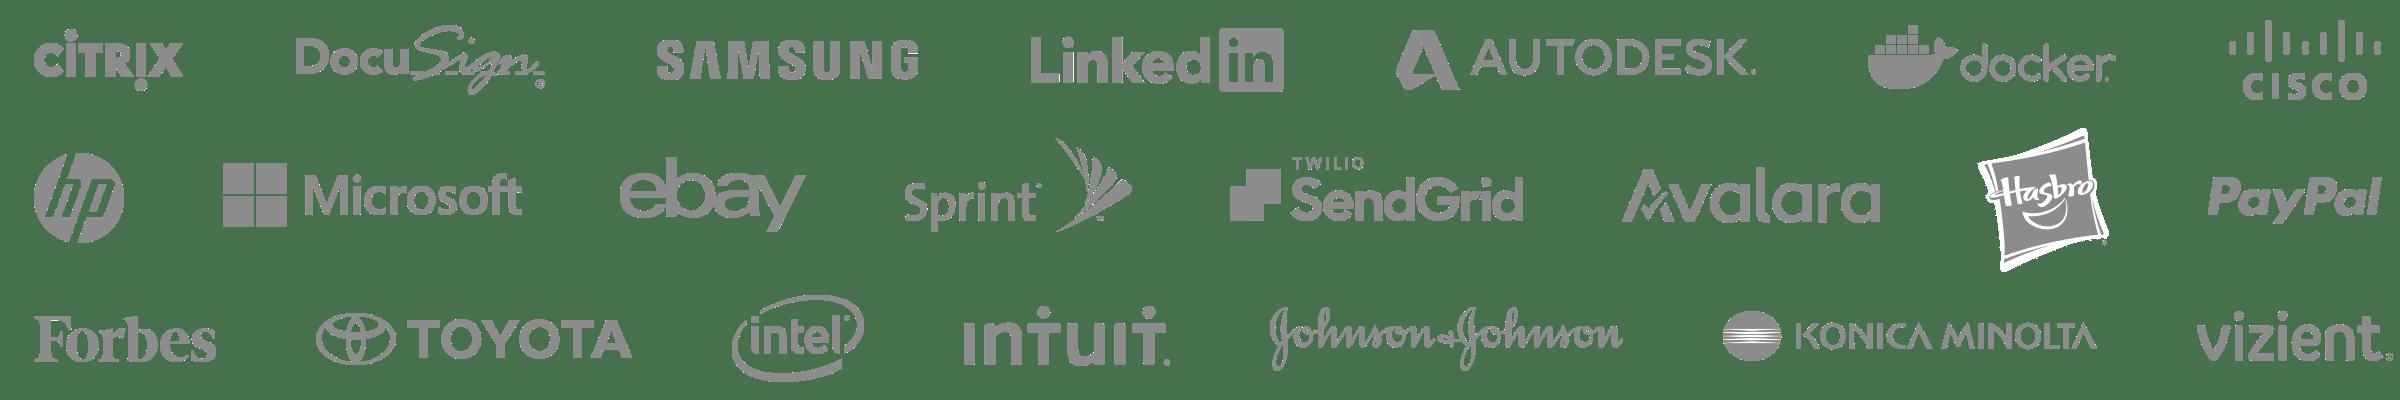 Logos for: Citrix, Docusign, Samsung, linkedIn, Autodesk, Docker, Cisco, HP, Microsoft, Ebay, Sprint, SendGrid, Avalara, Hasbro, PayPal, Forbes, Toyota, Intel, Intuit, Johnson & Johnson, Konica Minolta, and Vizient